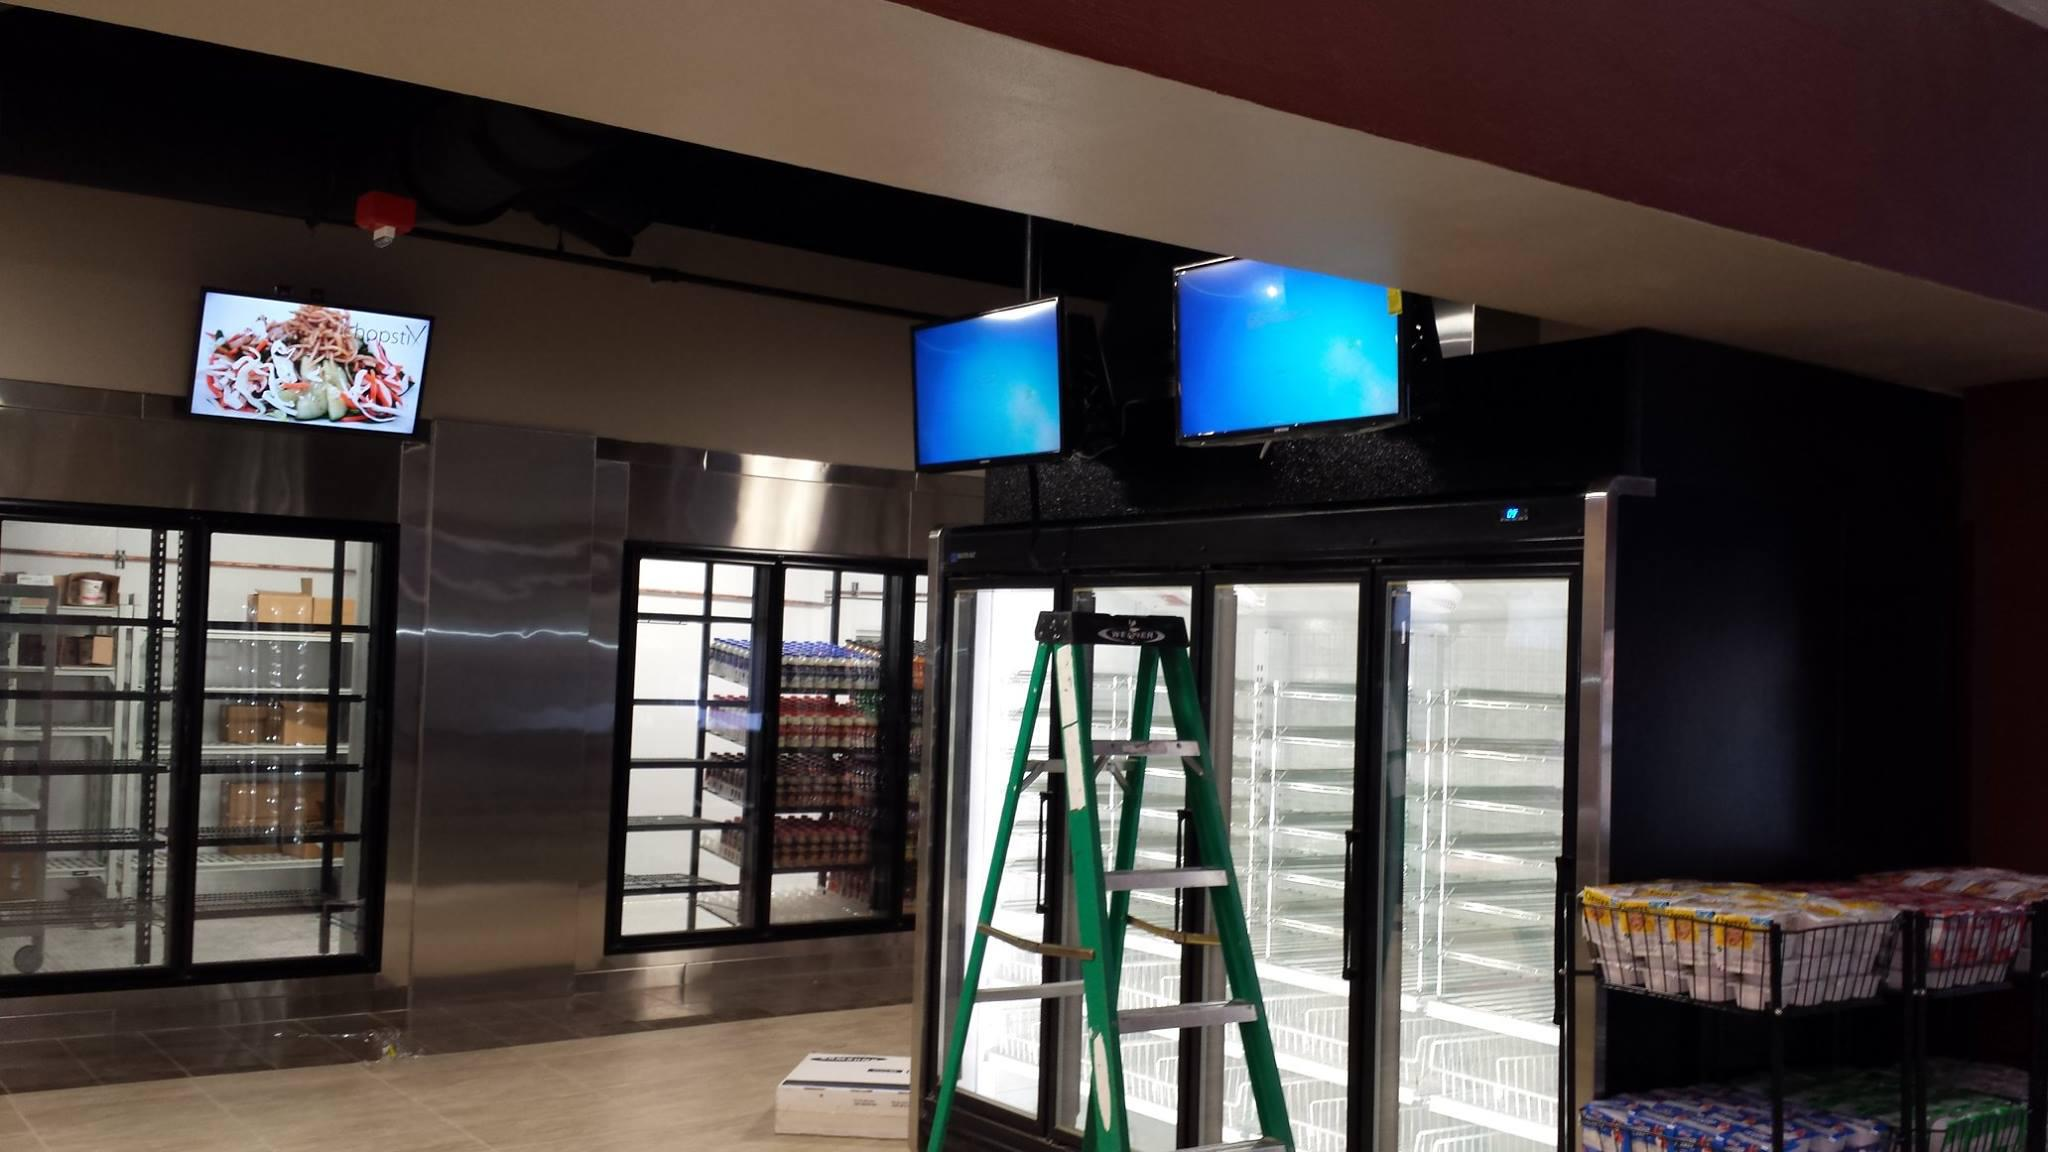 TV Installation Texas Homeland Security & Sound Lubbock (806)771-6810